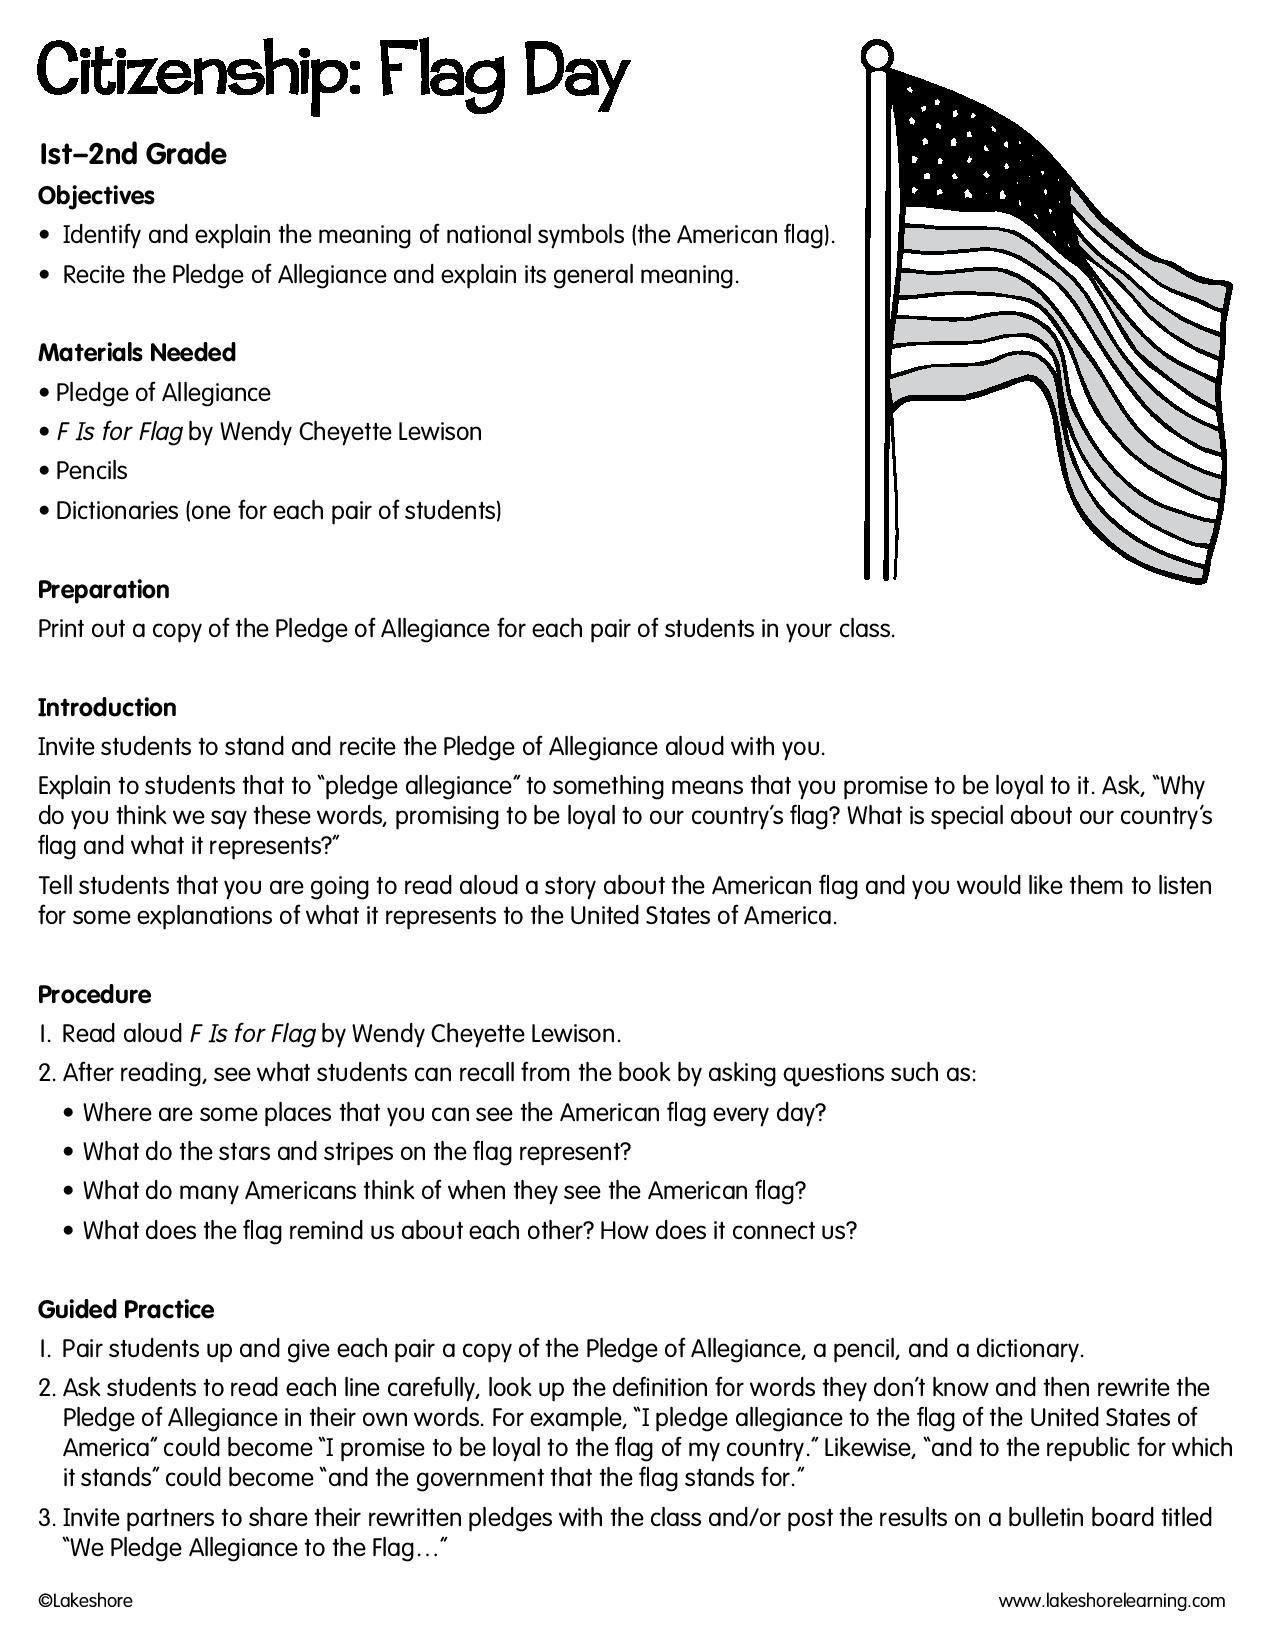 Citizenship Flag Day Lessonplan